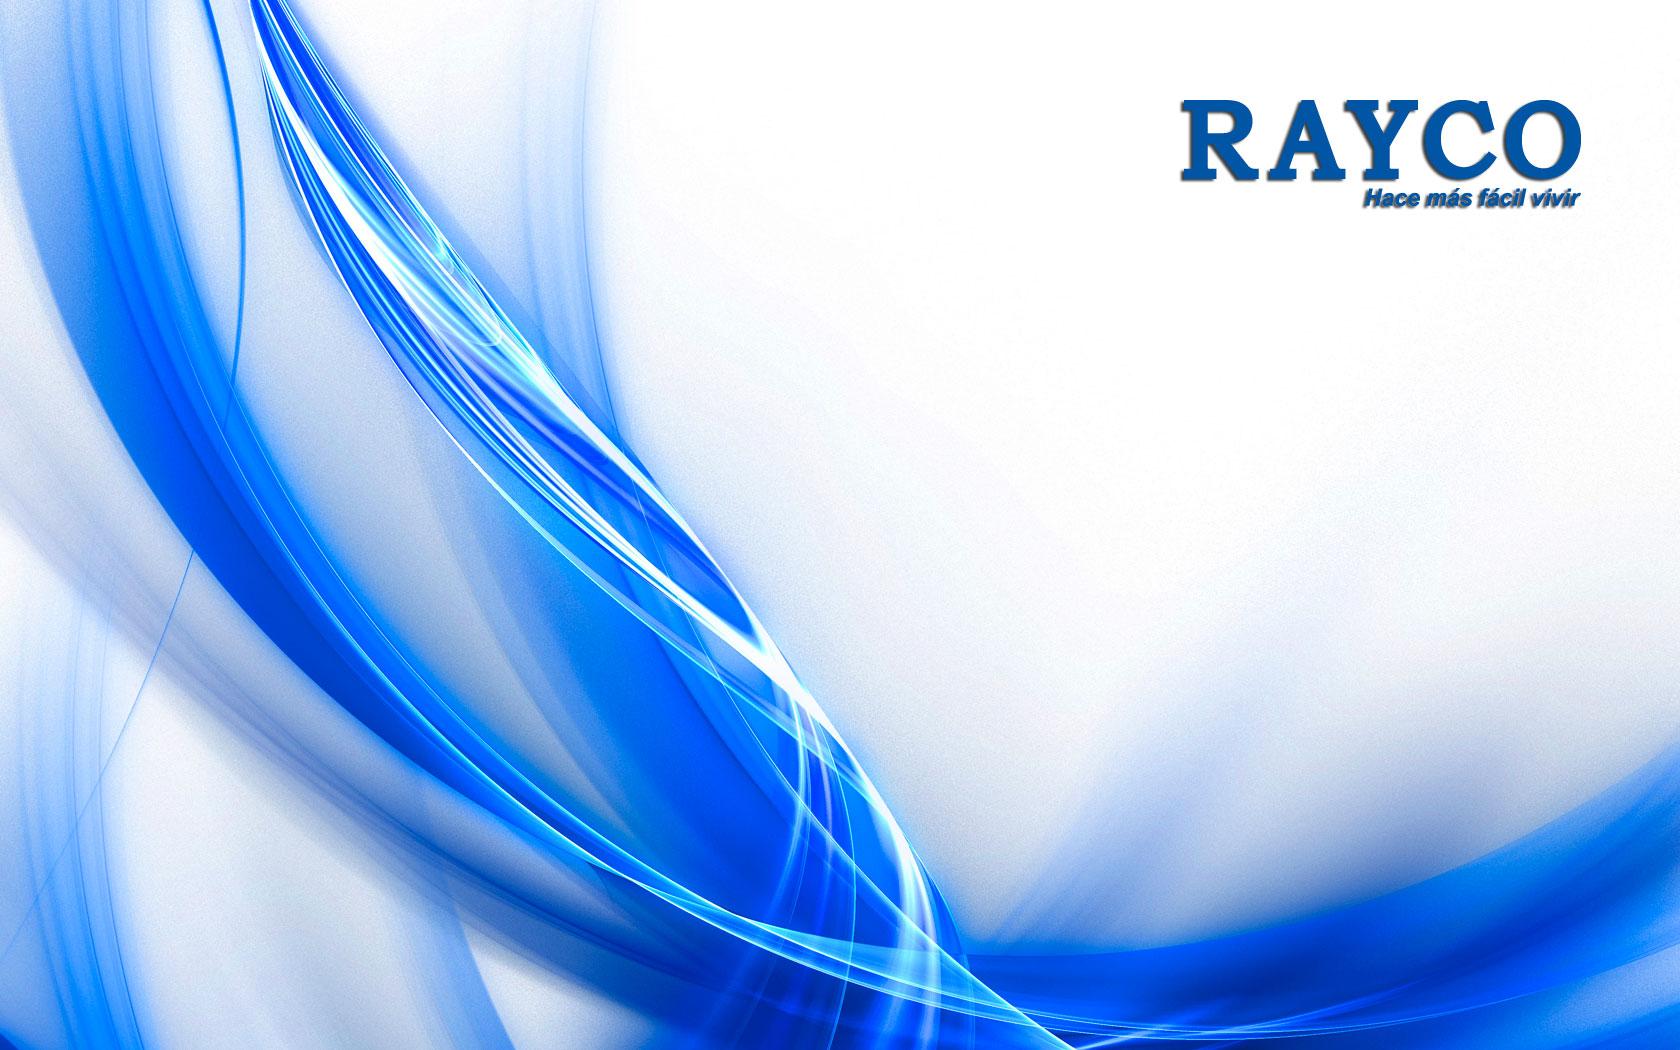 Distribuidora RAYCO S.A. Wallpapers